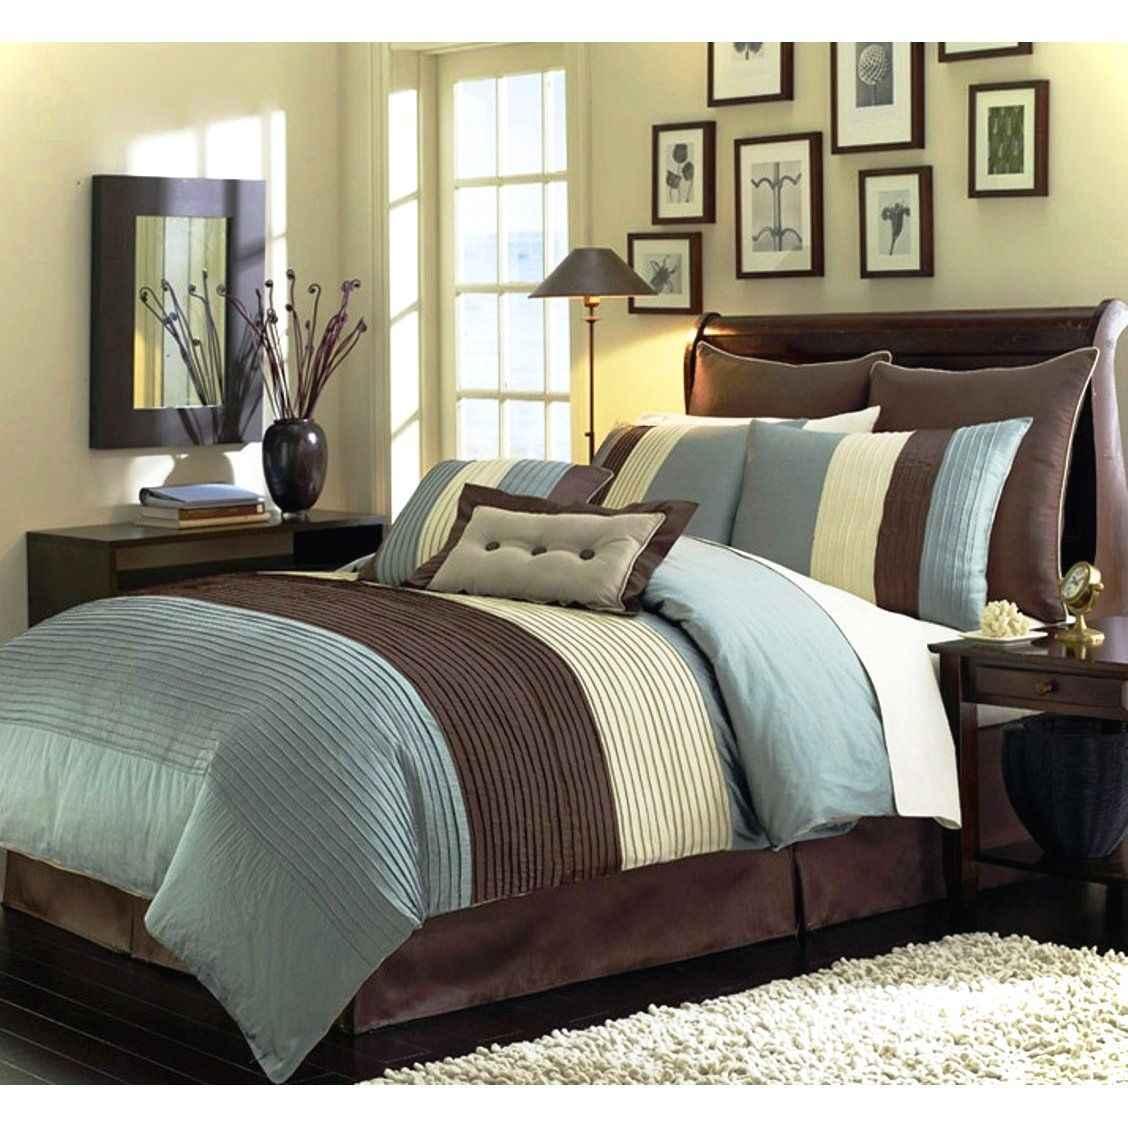 0077 luxurious bed linens color schemes ideas